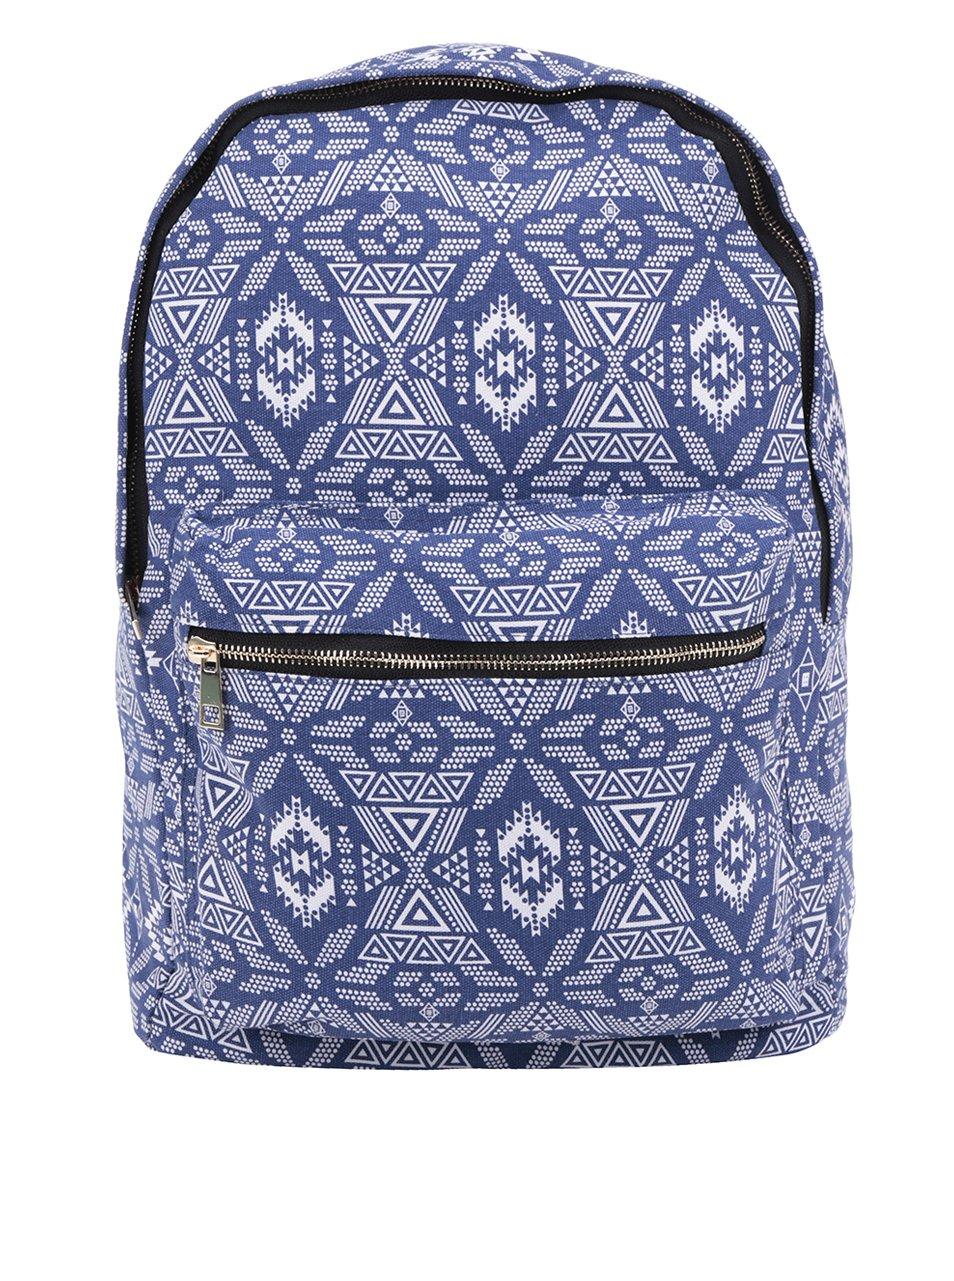 Bílo-modrý dámský vzorovaný plátěný batoh ZOOT